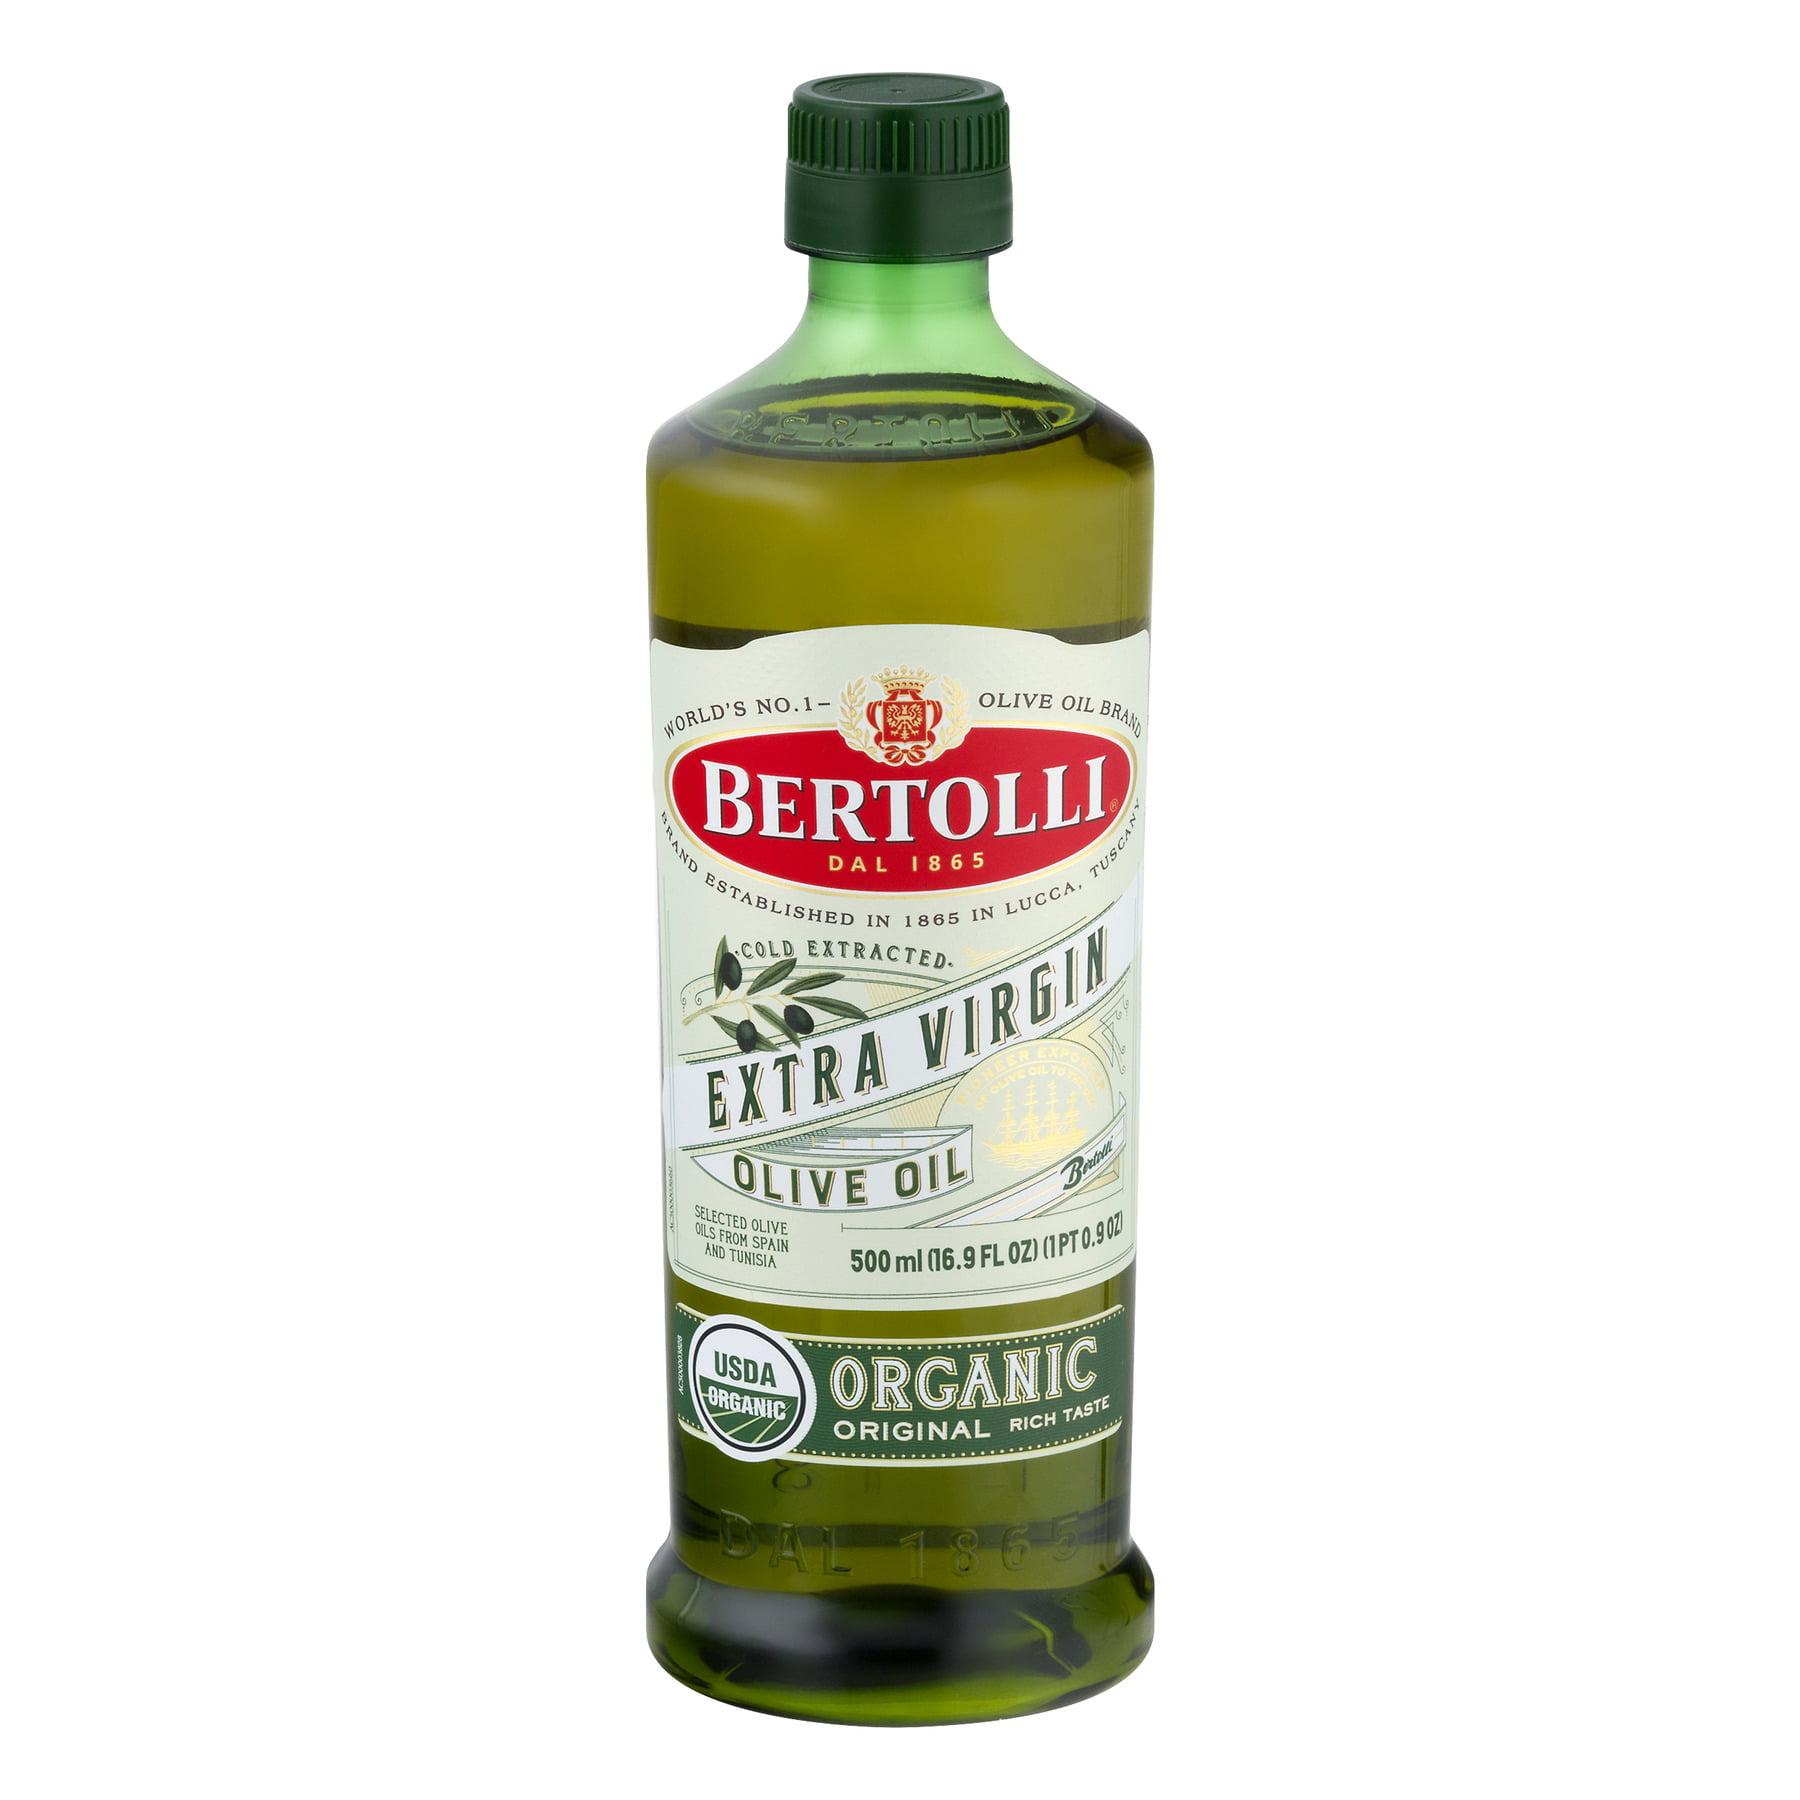 Bertolli Organic Extra Virgin Olive Oil, 17 fl oz